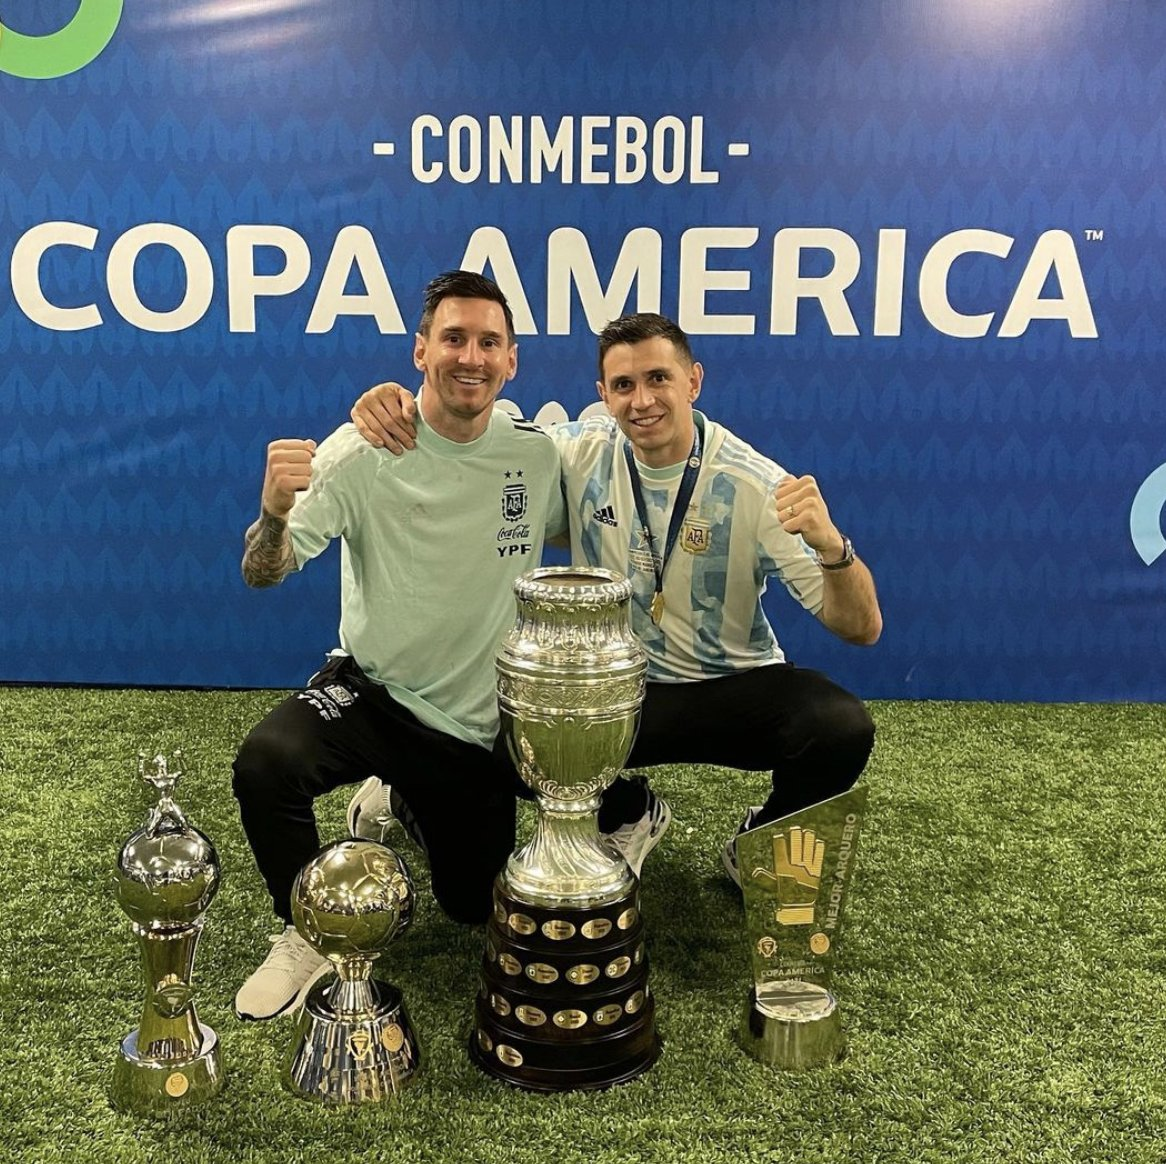 Vamos, vamos, Argentina. Esa Copa linda y deseada - Página 13 E5_ld3DXEAA91_0?format=jpg&name=medium